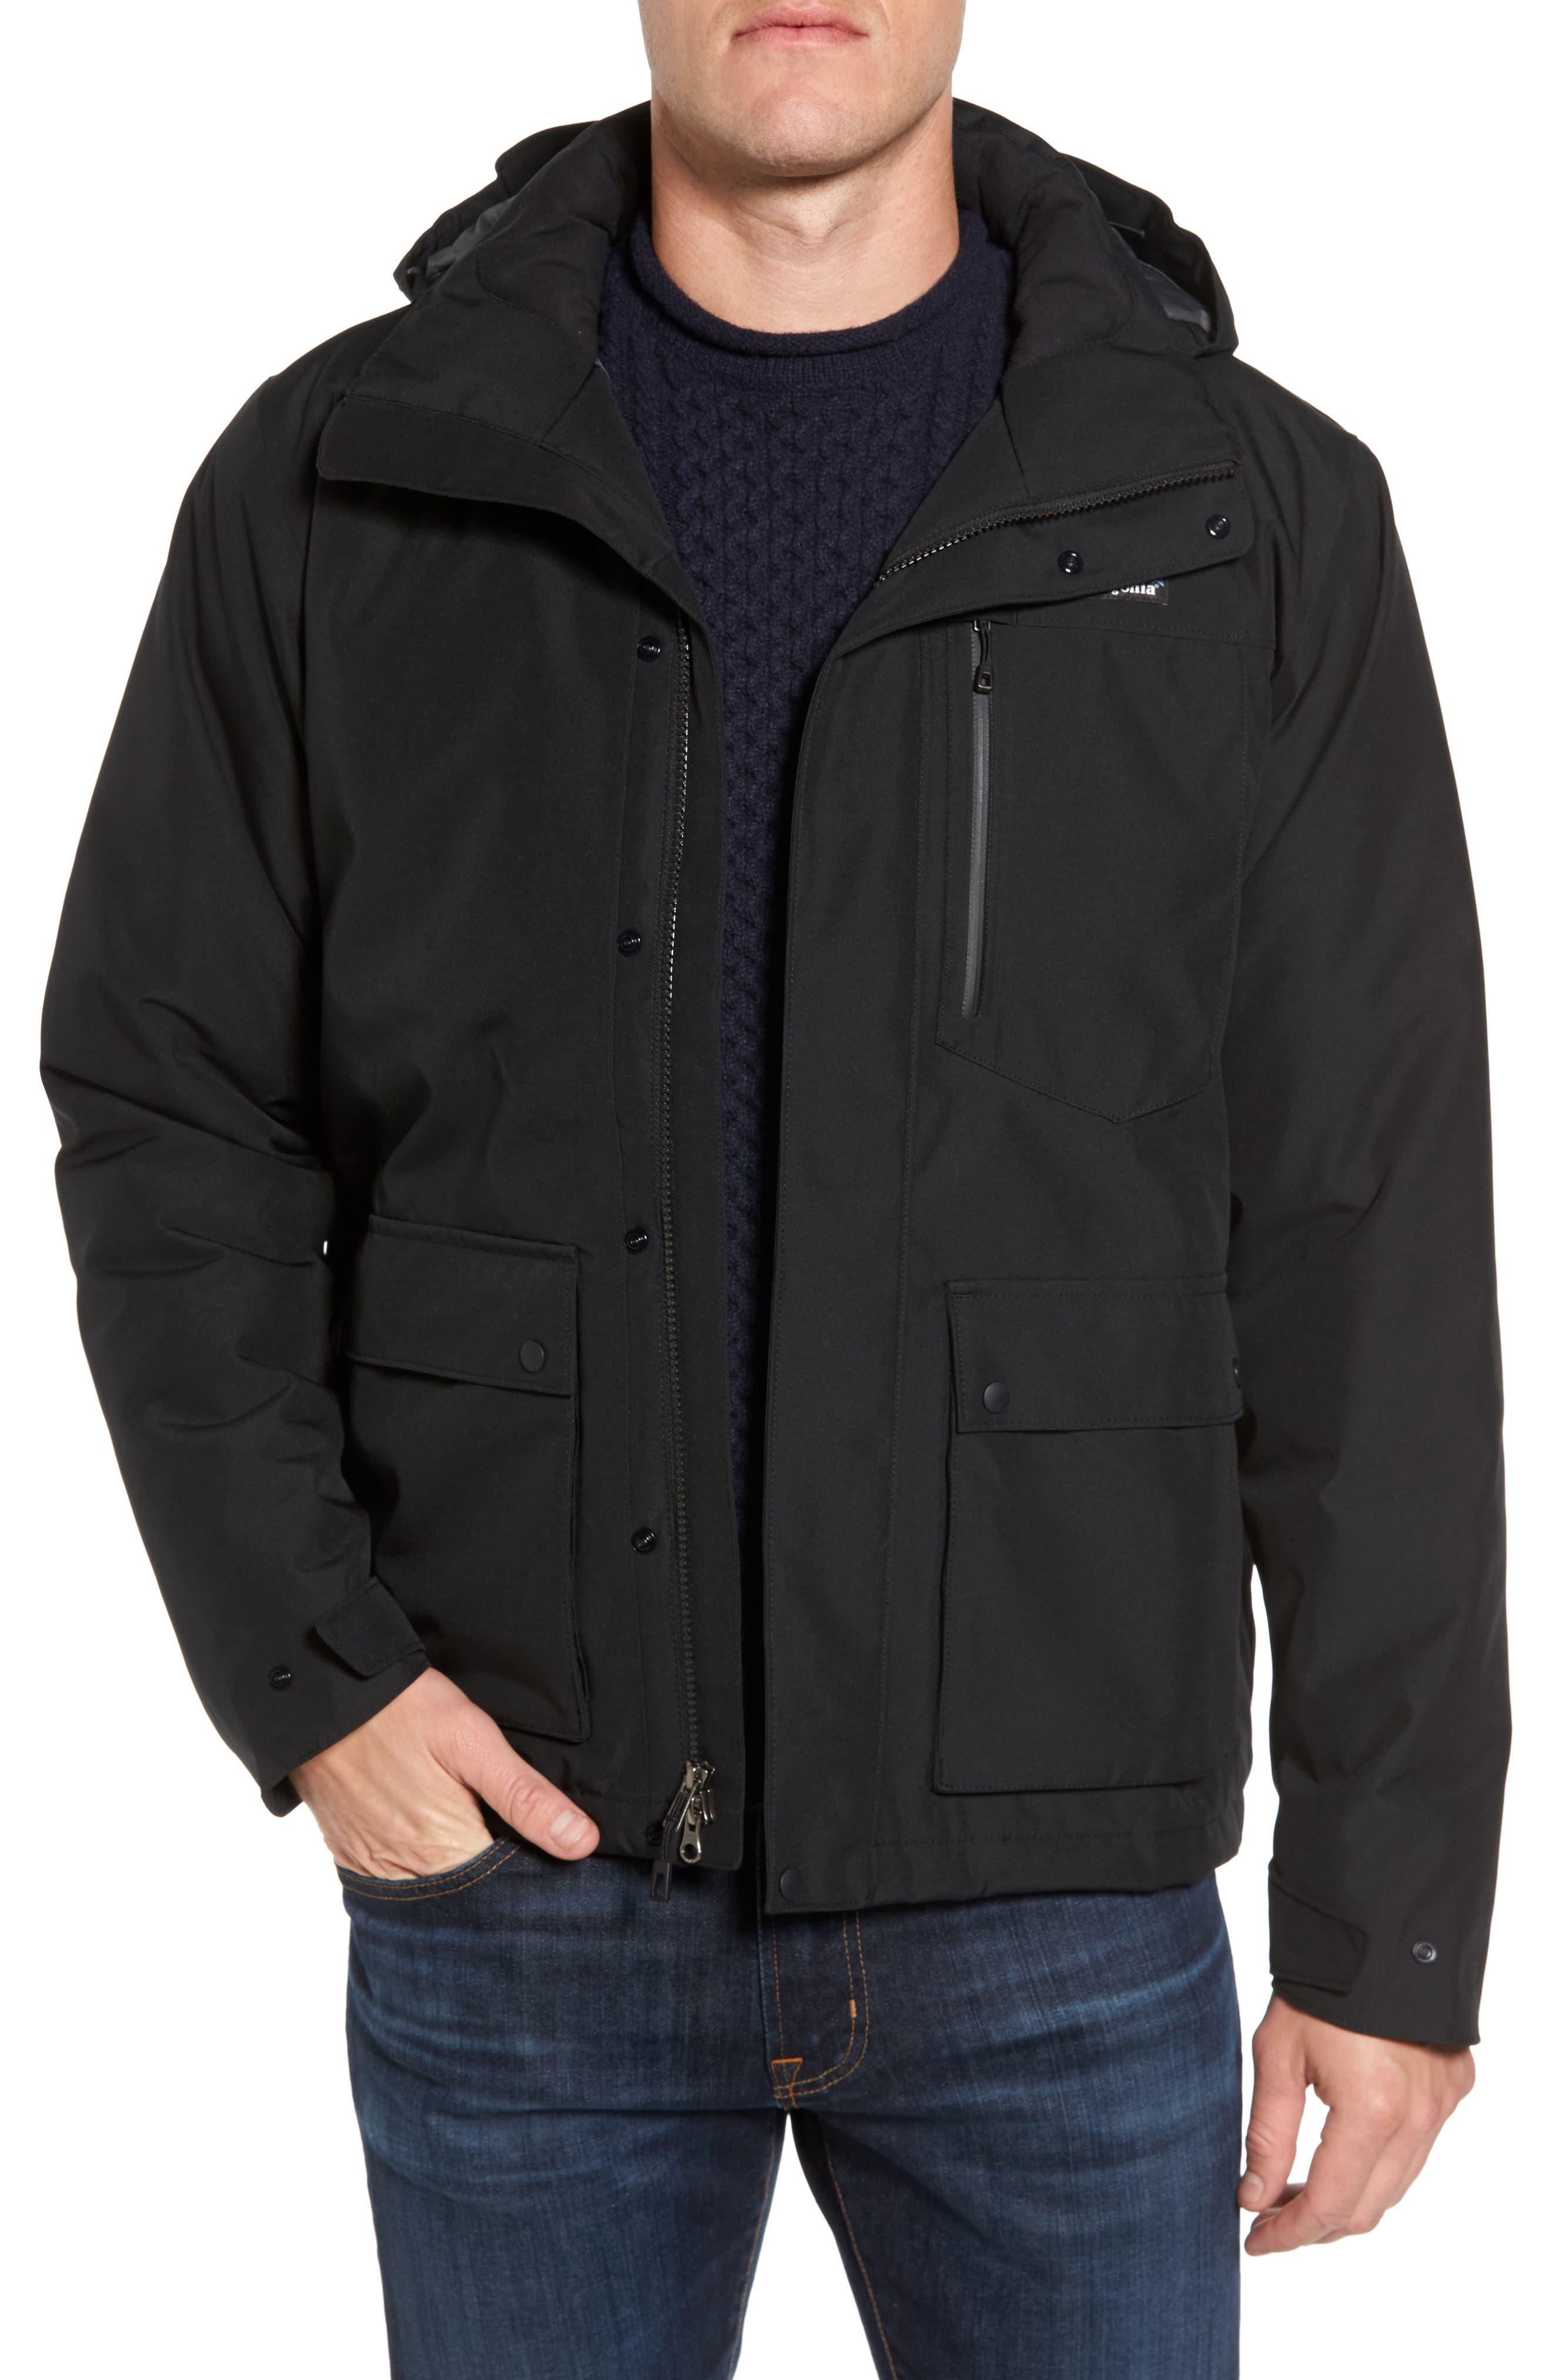 Topley Waterproof Down Jacket,                             Main thumbnail 1, color,                             Black